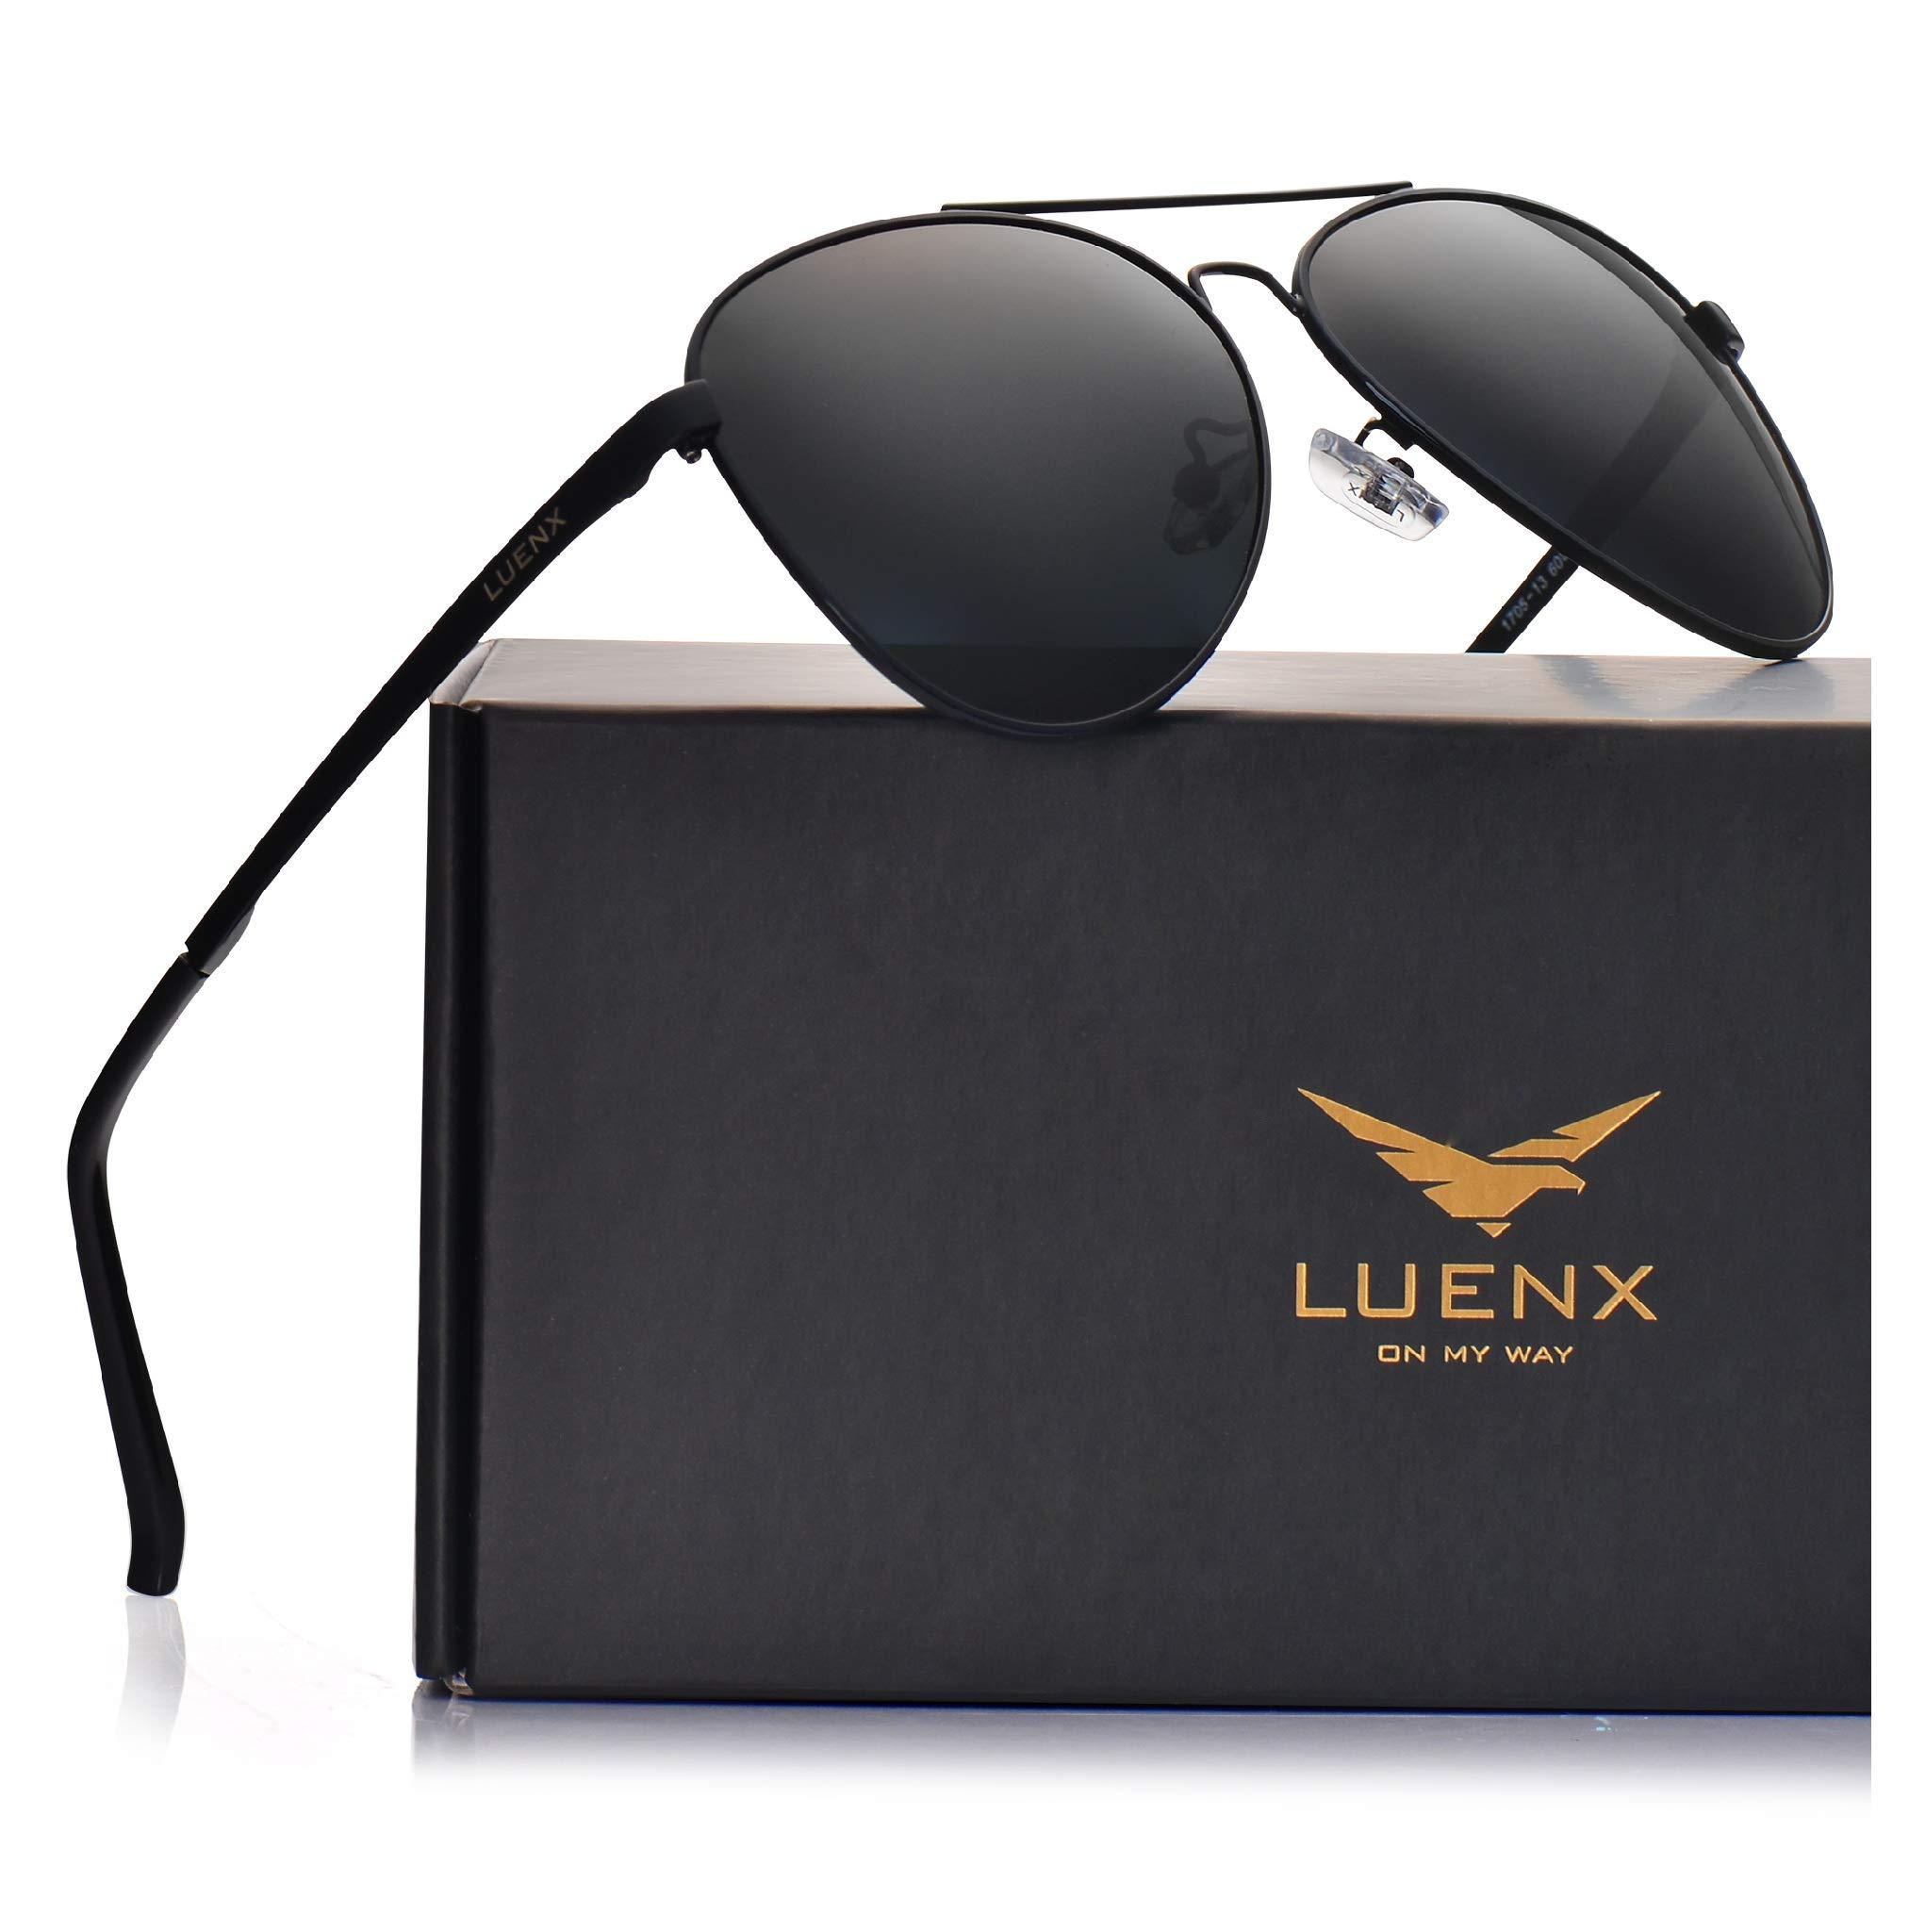 c98450fce4 LUENX Men Women Aviator Sunglasses Polarized Non-Mirror Black Lens Black  Metal Frame with Accessories UV 400 Protection 60MM